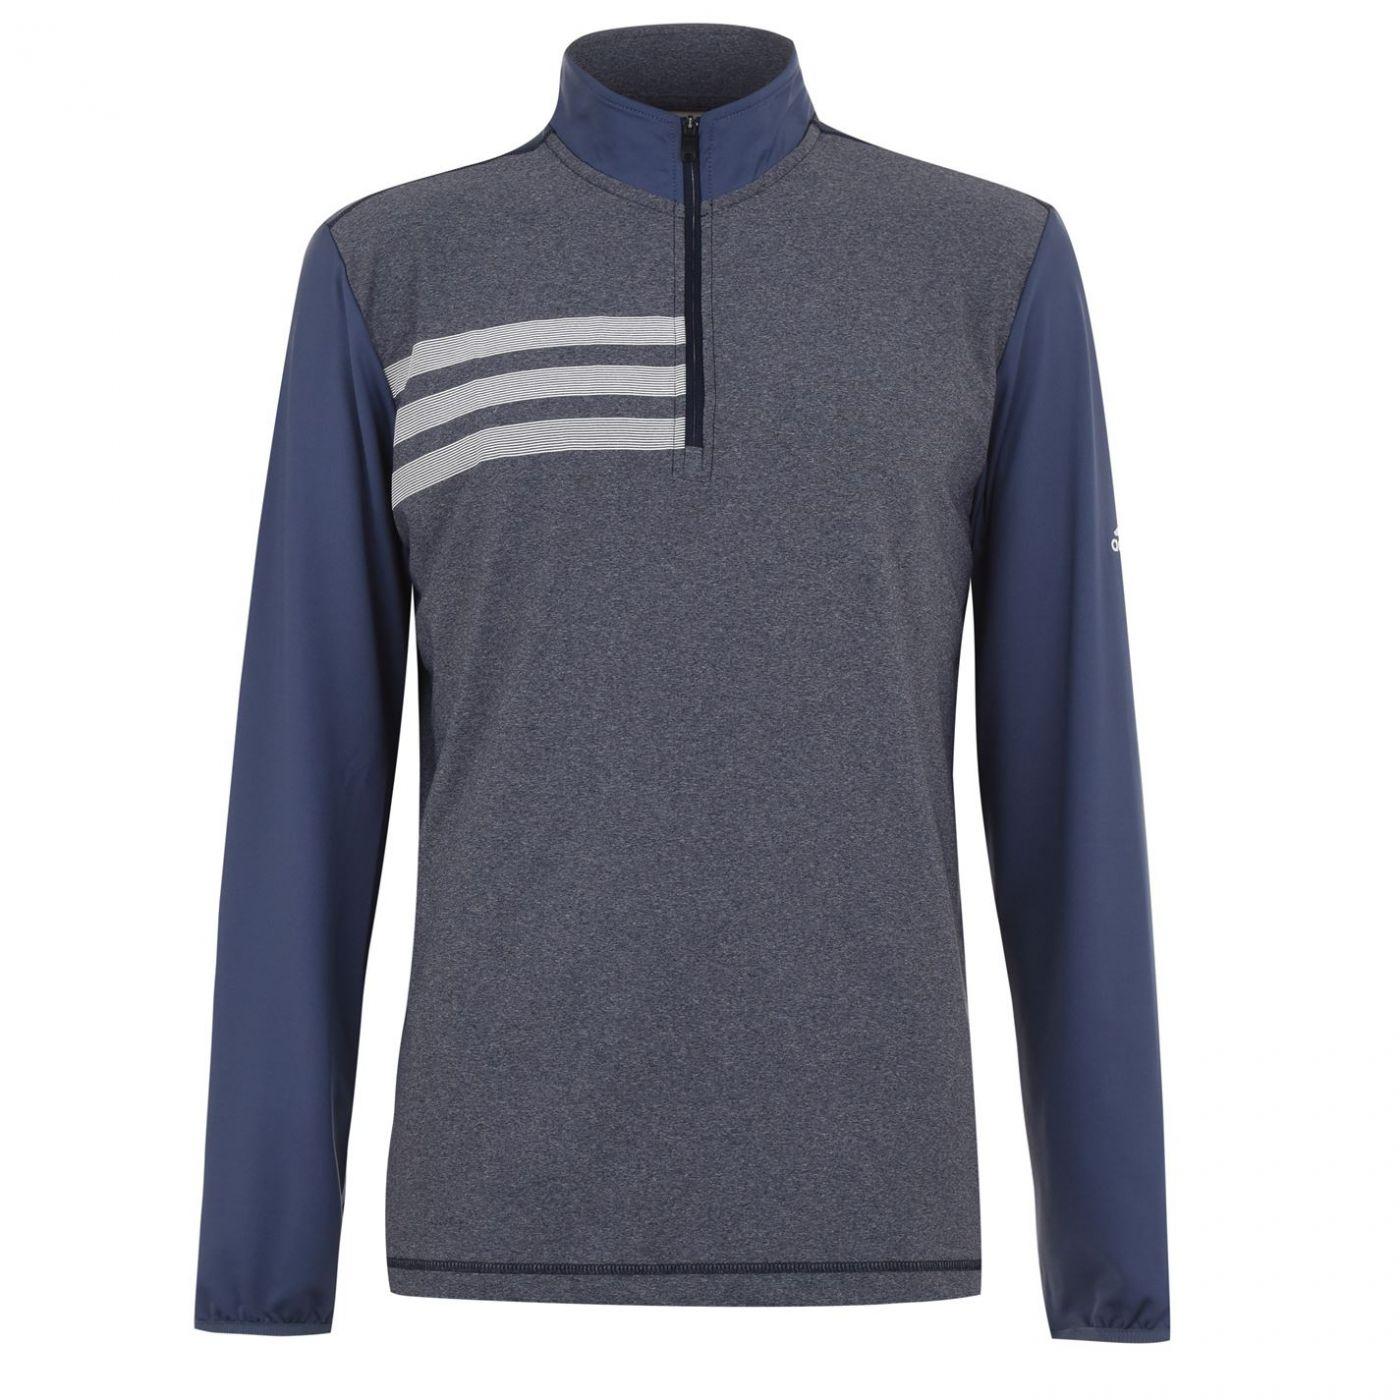 Adidas 3 Stripe Top Sn 94